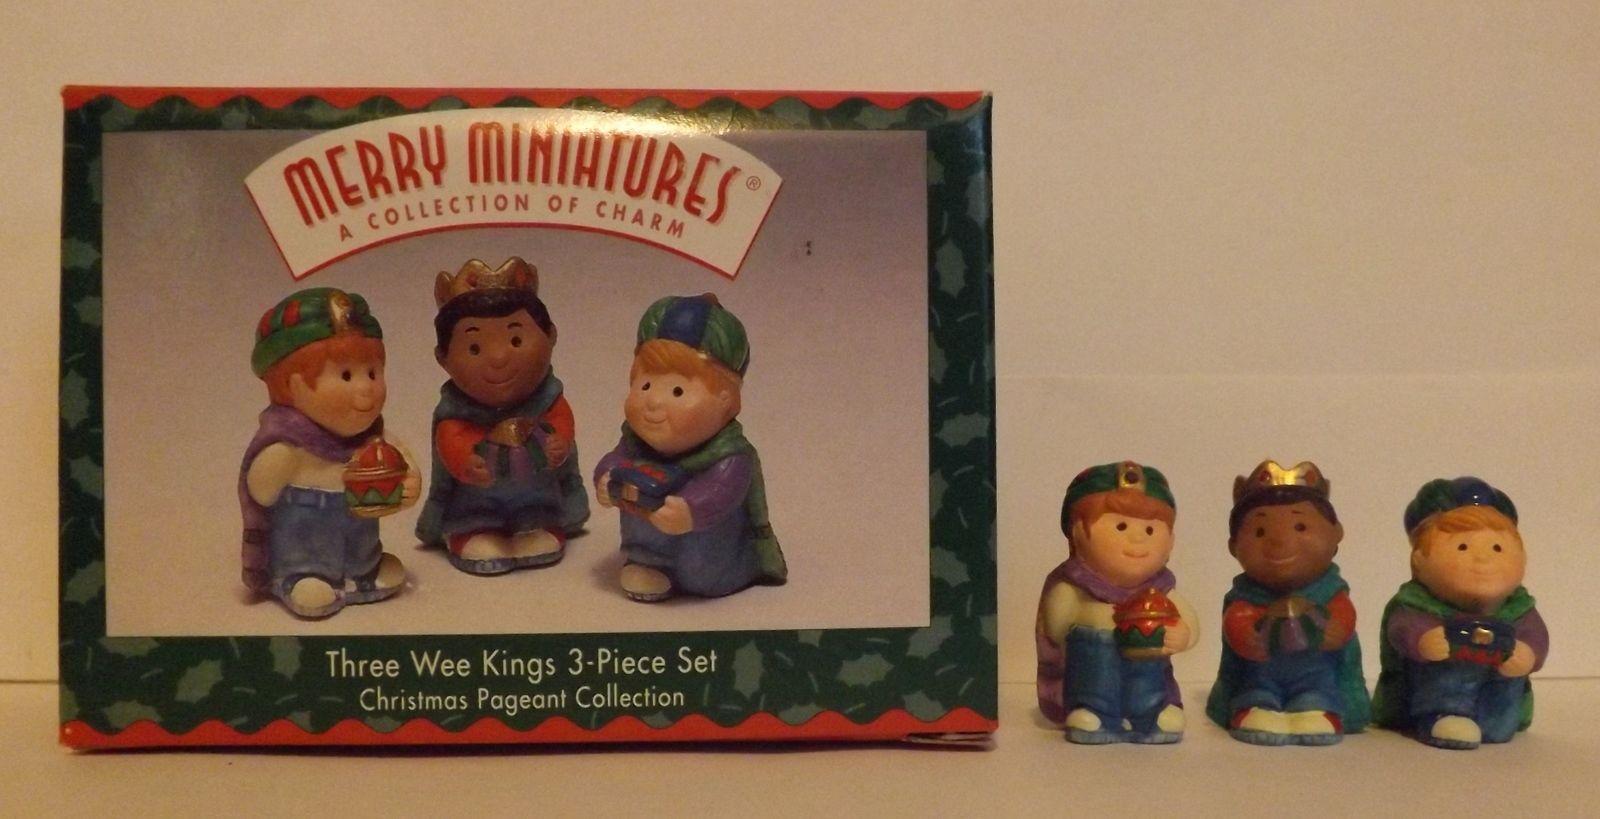 Hallmark Merry Miniatures Three Wee Kings 3-Piece Set Holidays 1997